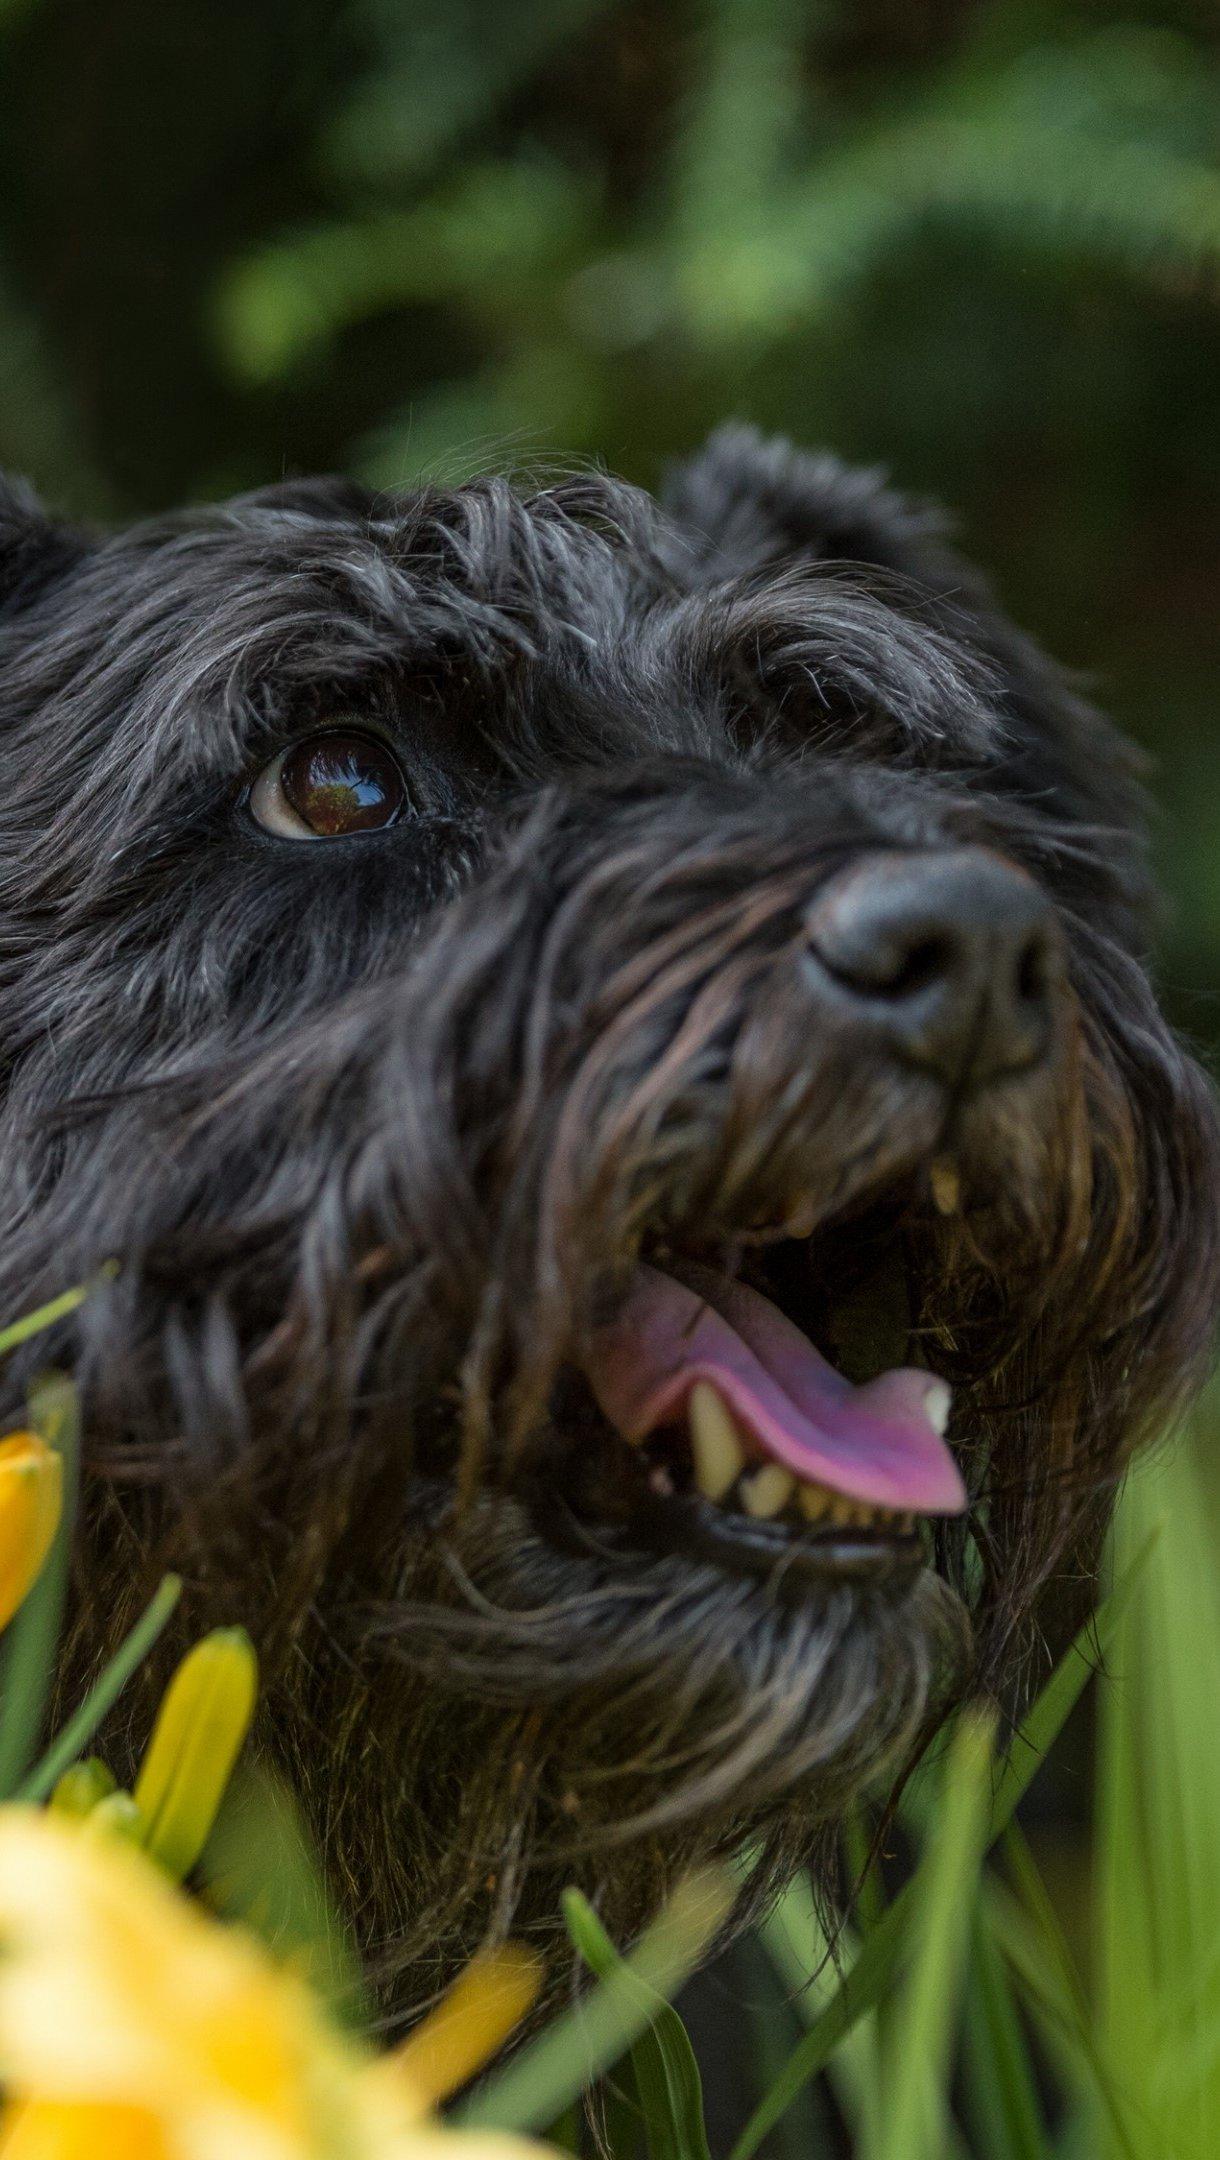 Fondos de pantalla Cachorro en un jardín Vertical